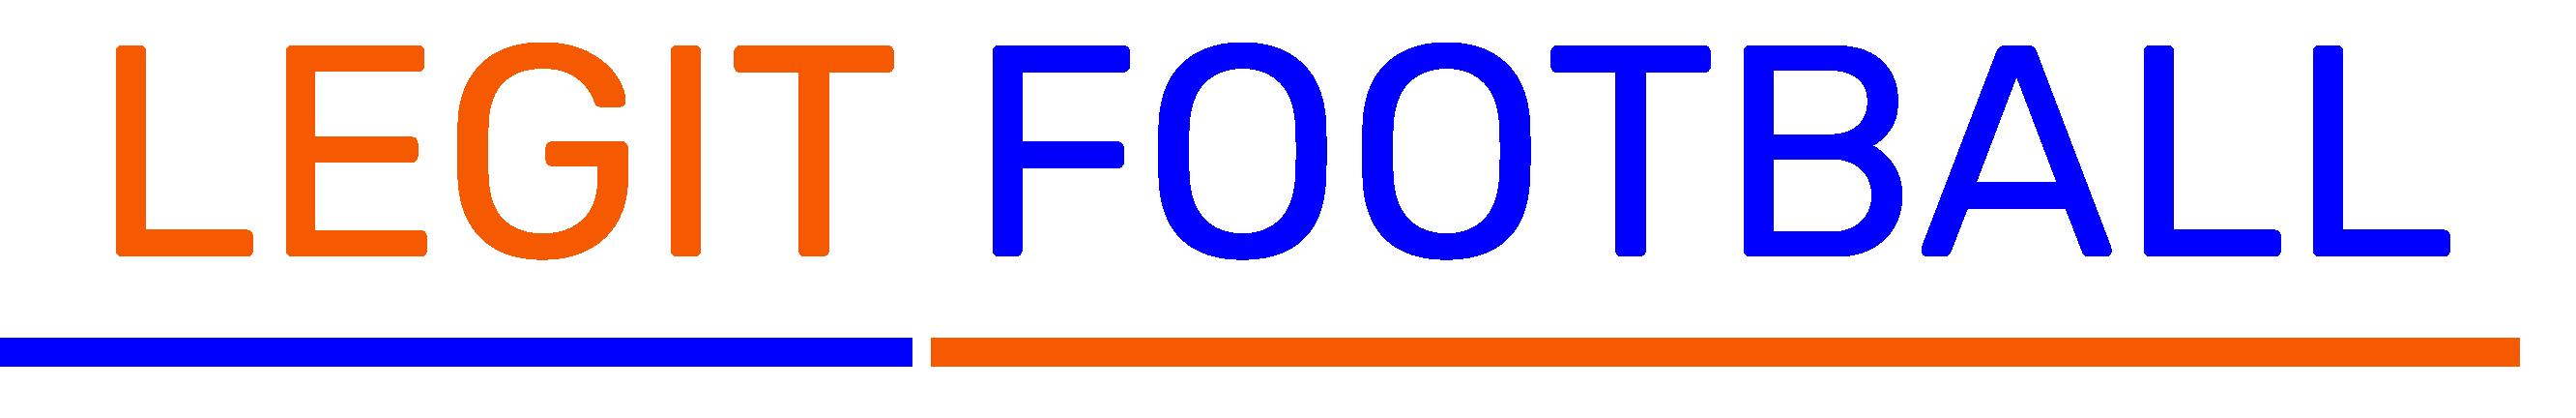 Legit Football Logo